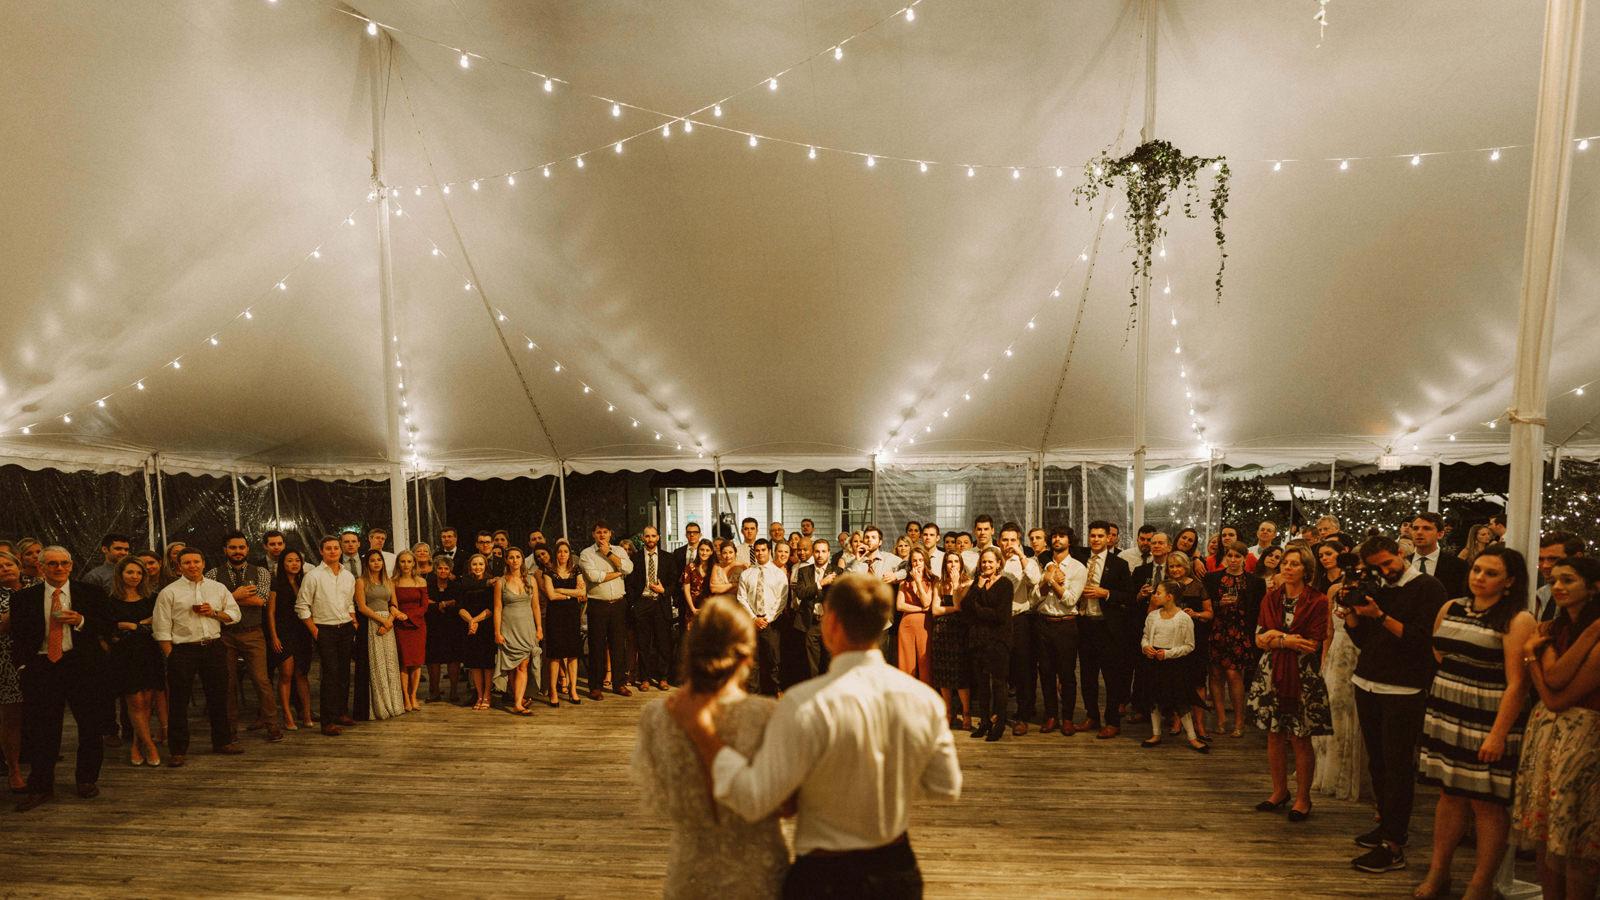 bridgeport-wedding-163 BRIDGEPORT, CONNECTICUT BACKYARD WEDDING